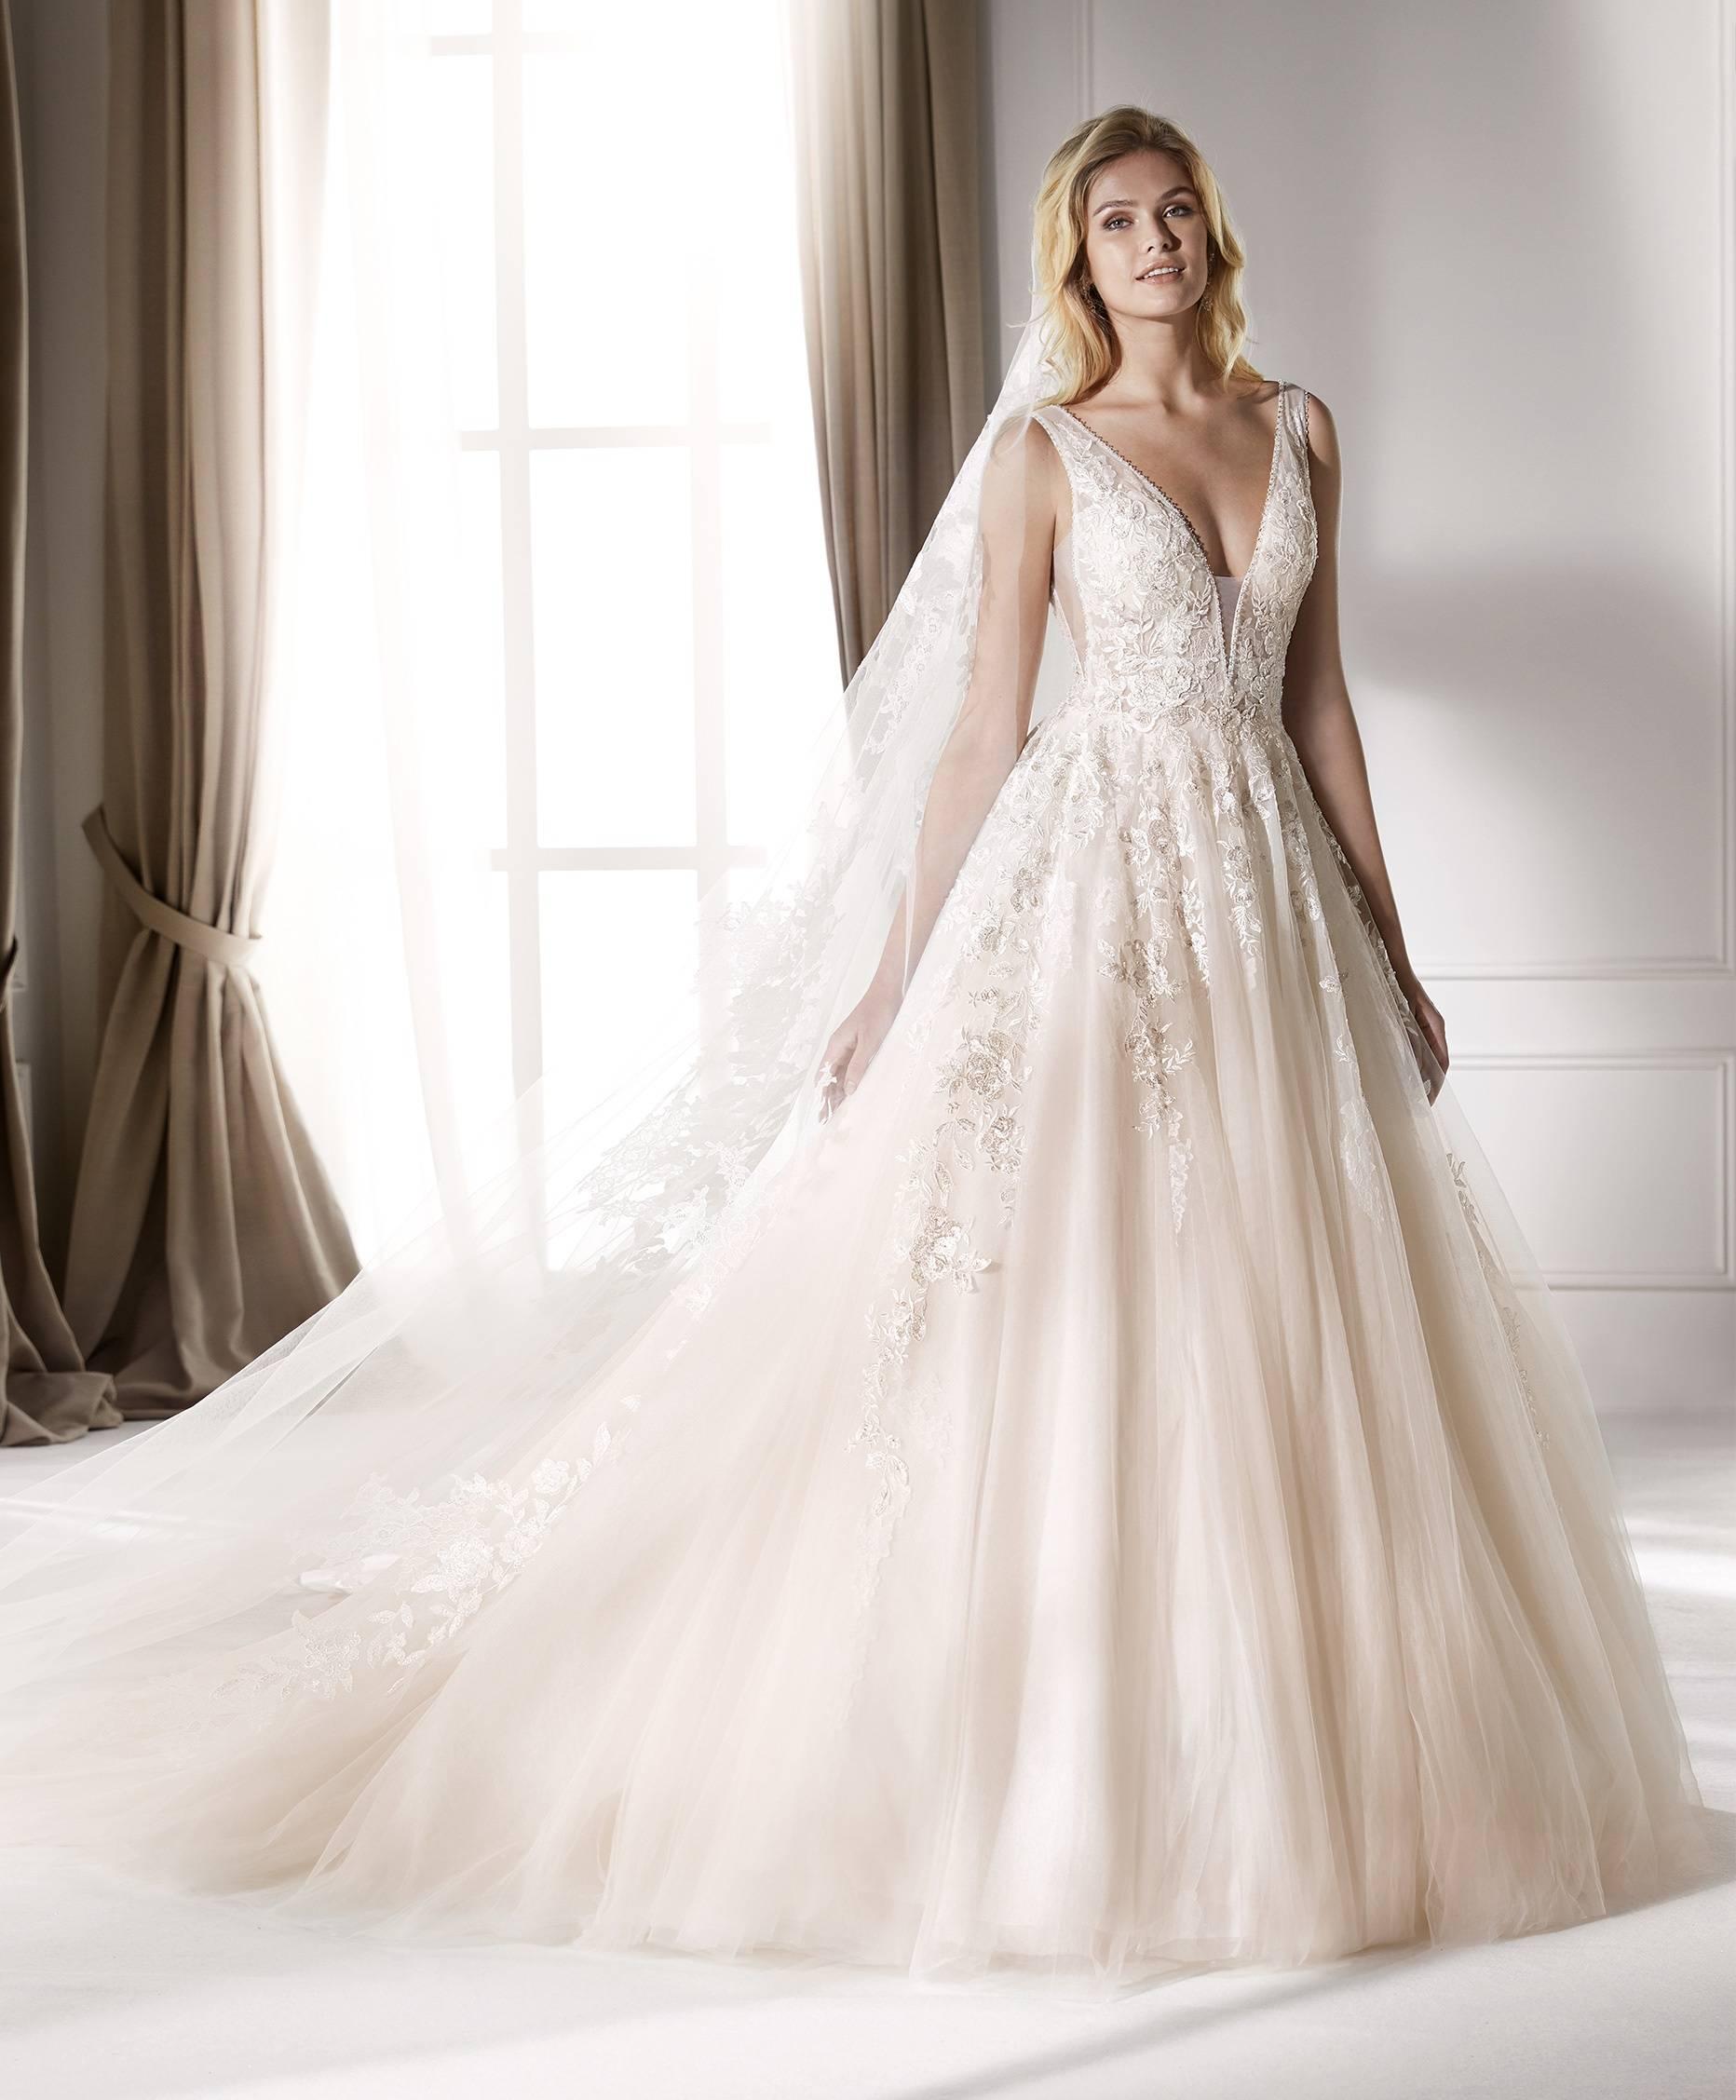 NICOLE MILANO NIA20221 WEDDING DRESS